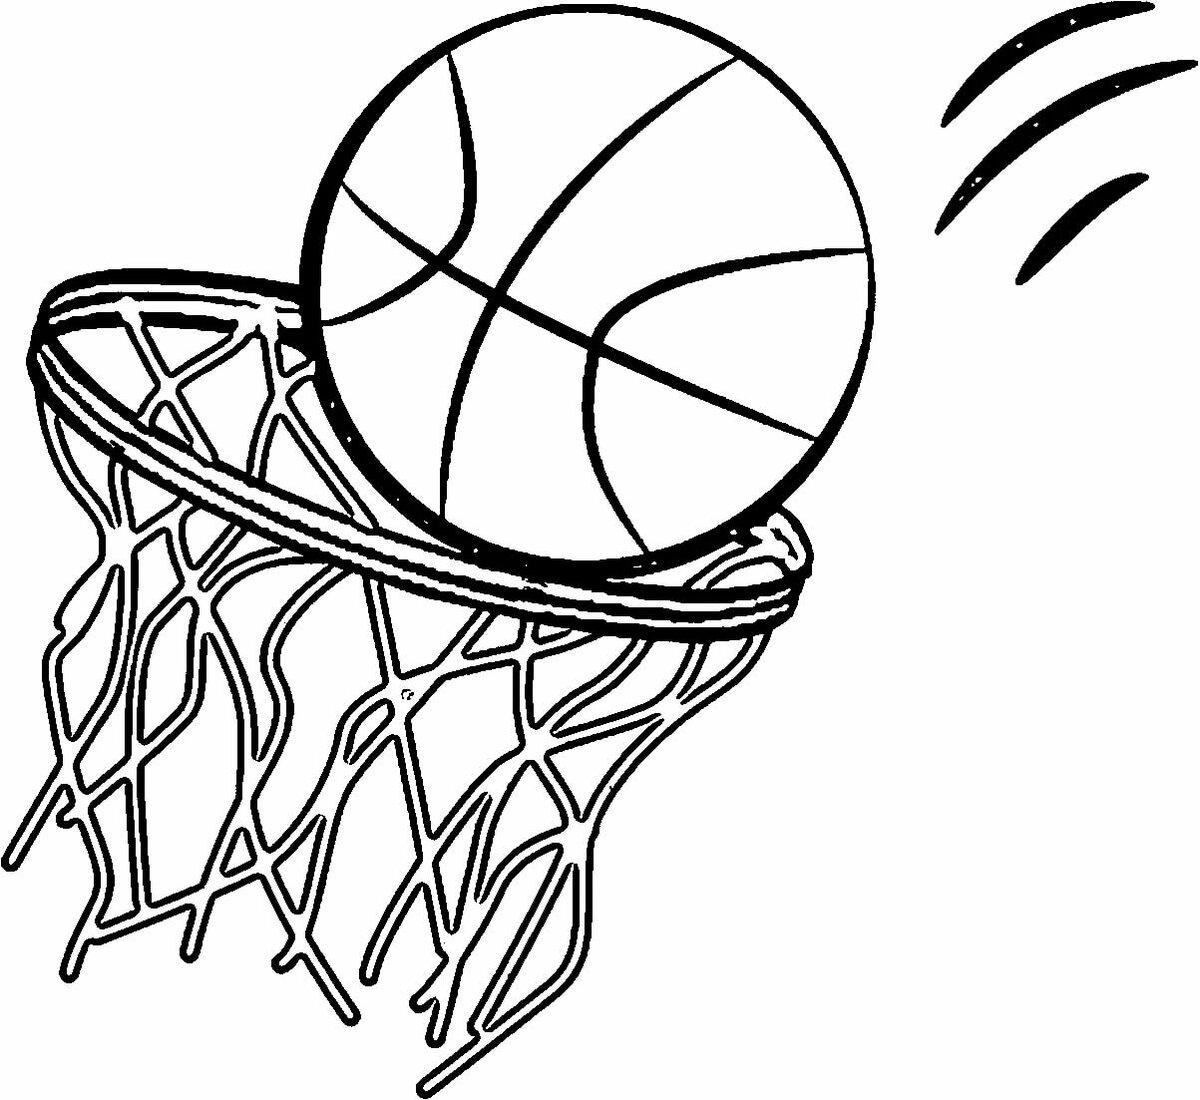 Картинки на тему баскетбол рисунок